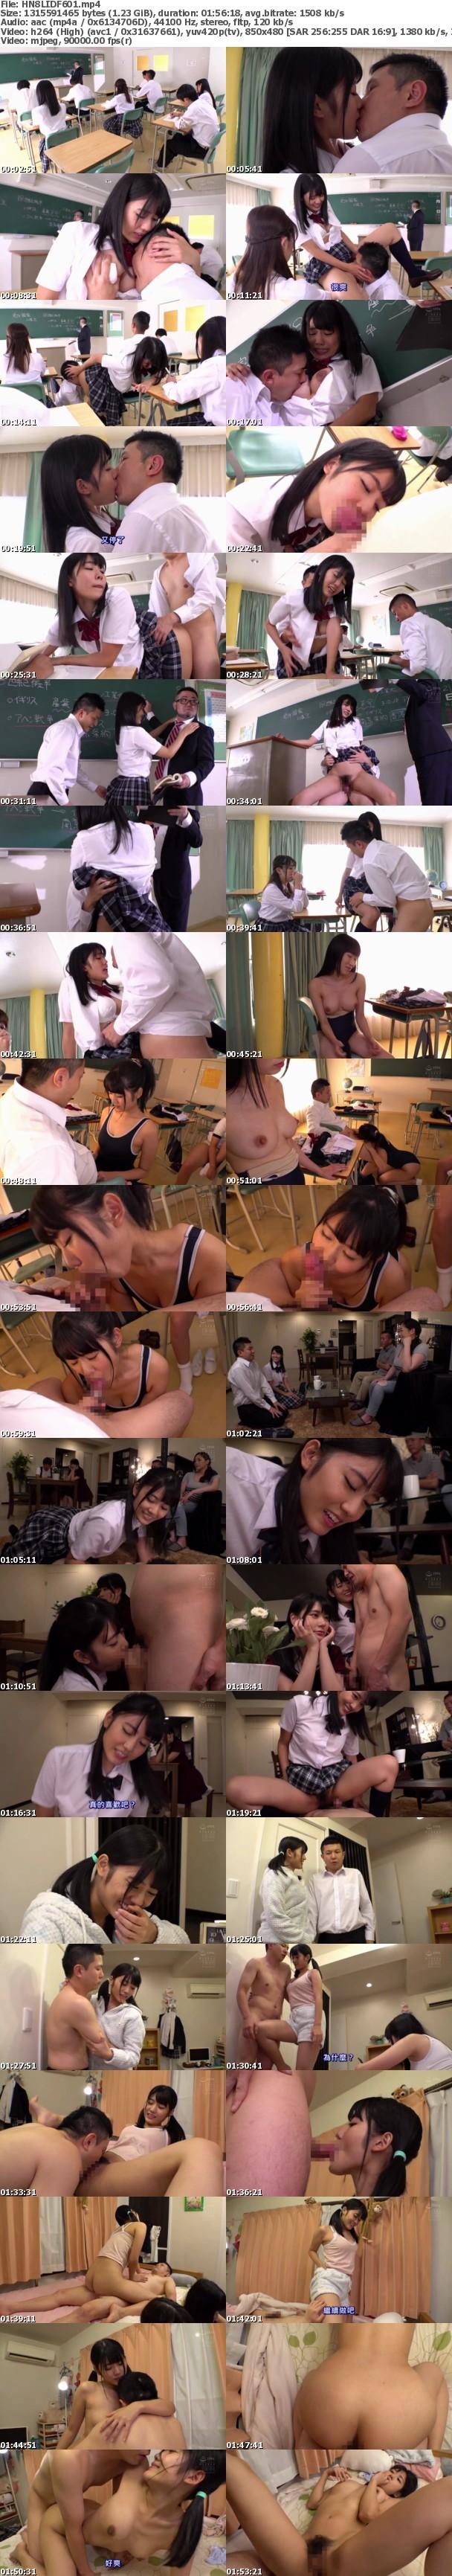 HND-601 時間停止少女 停住時間與喜歡的男生1對1猛肏到中出 神宮寺奈緒[中文字幕]